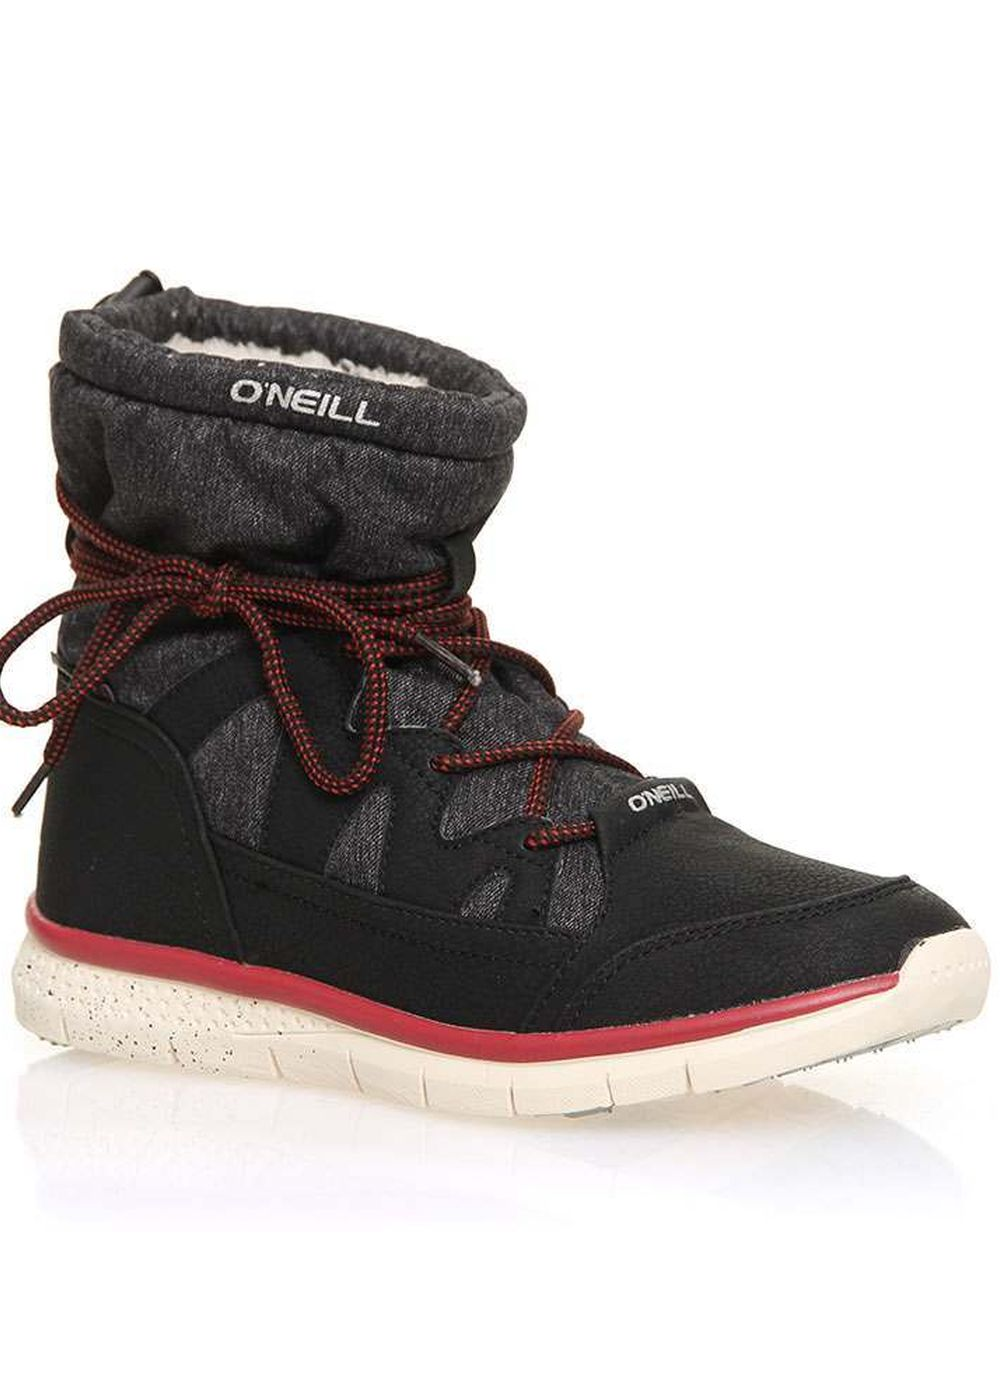 oneill-bella-lt-snowjogger-boots-black